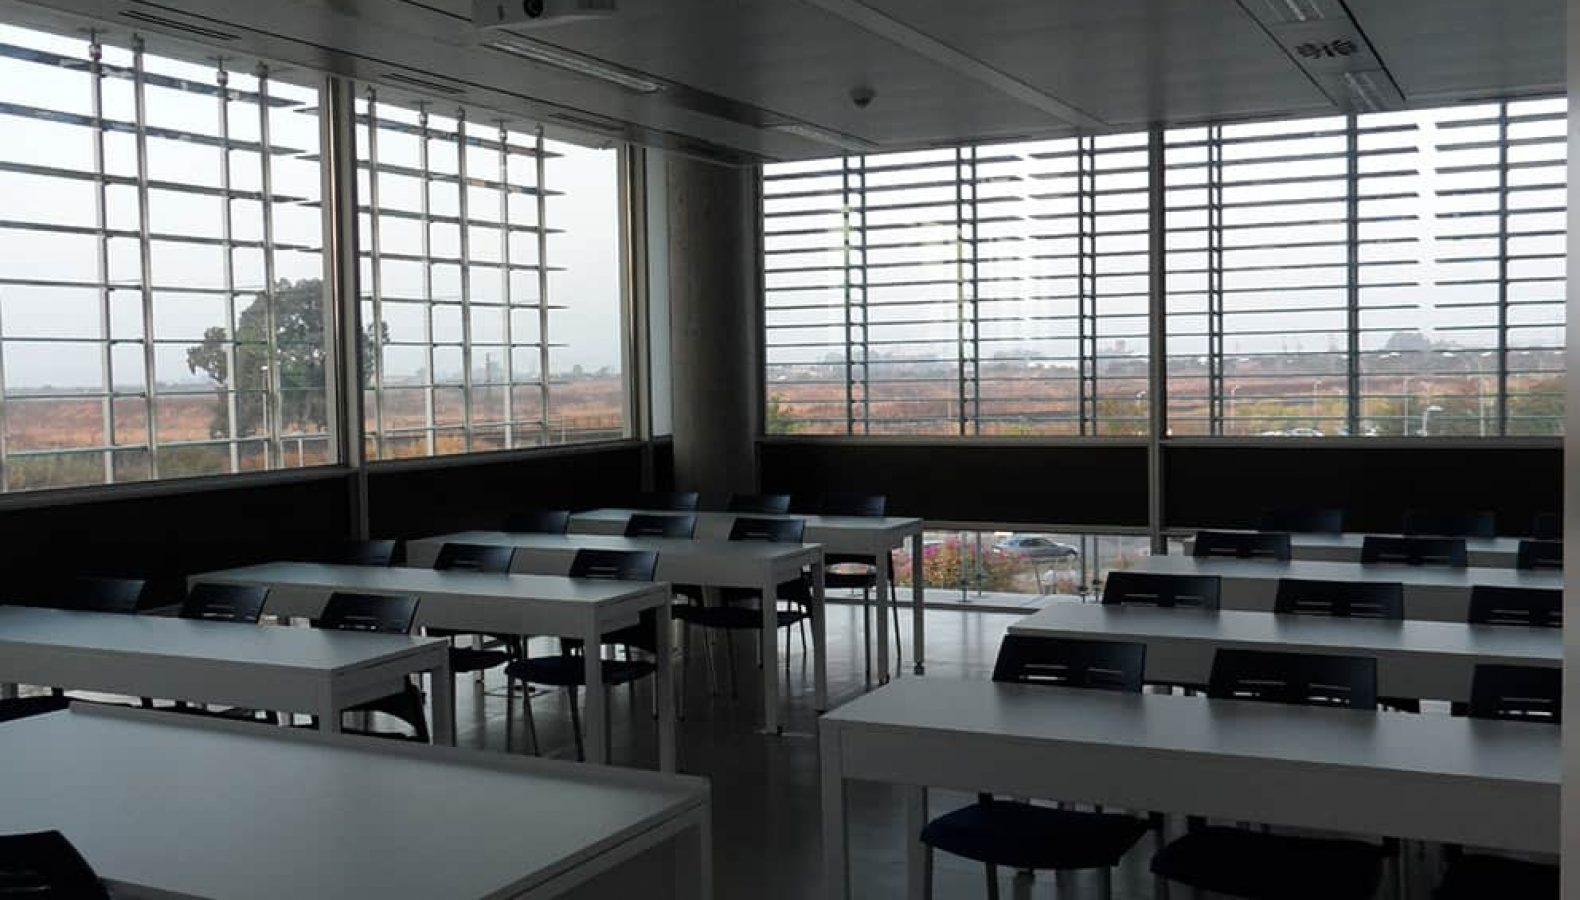 Aulario Universidad Loyola